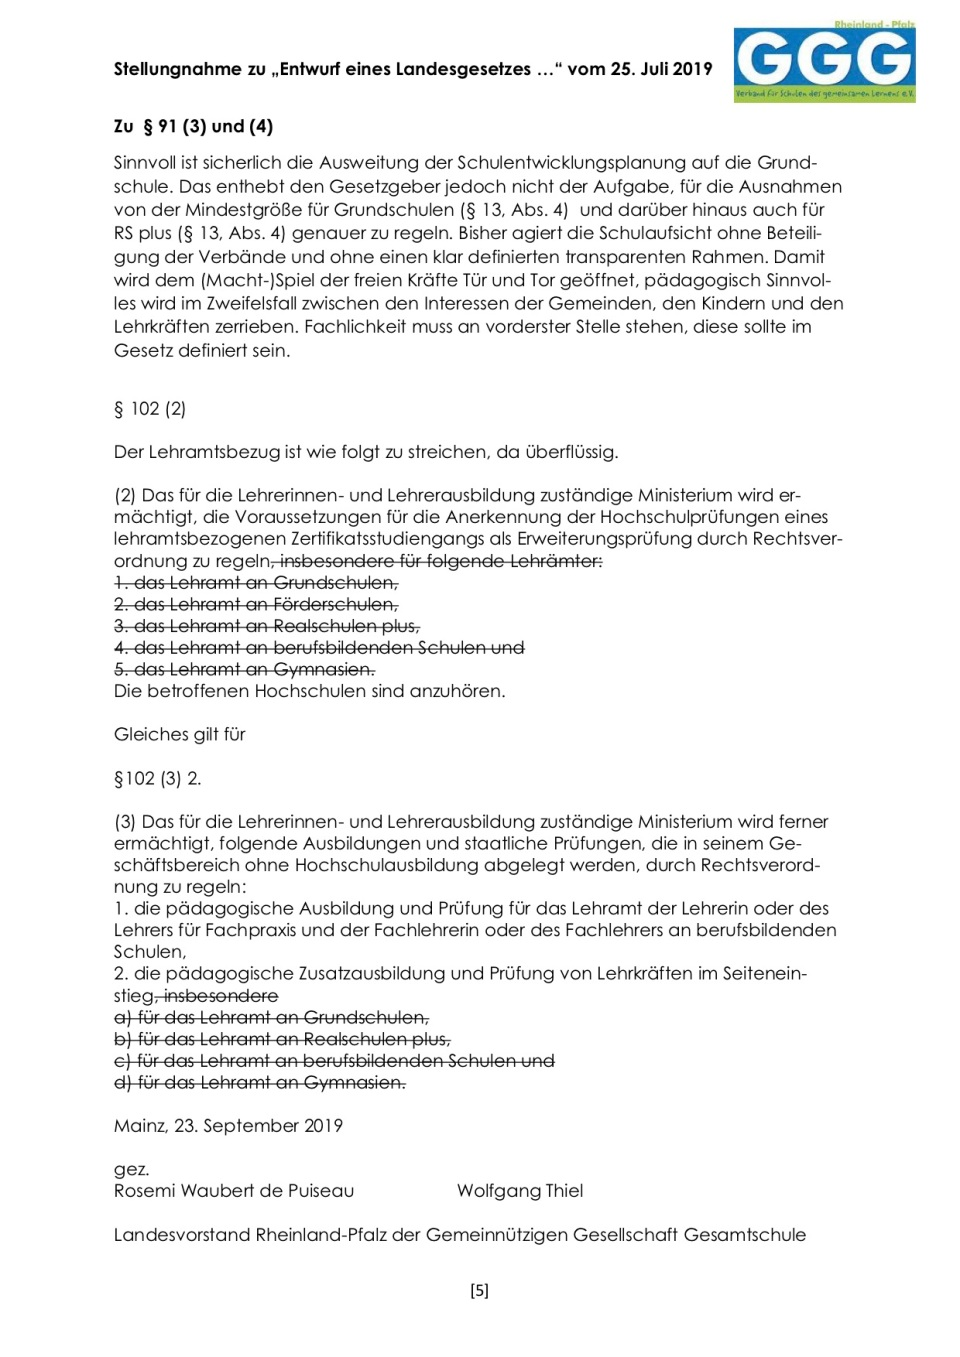 19_0916_StN_SchulG-Novelle-wht-6